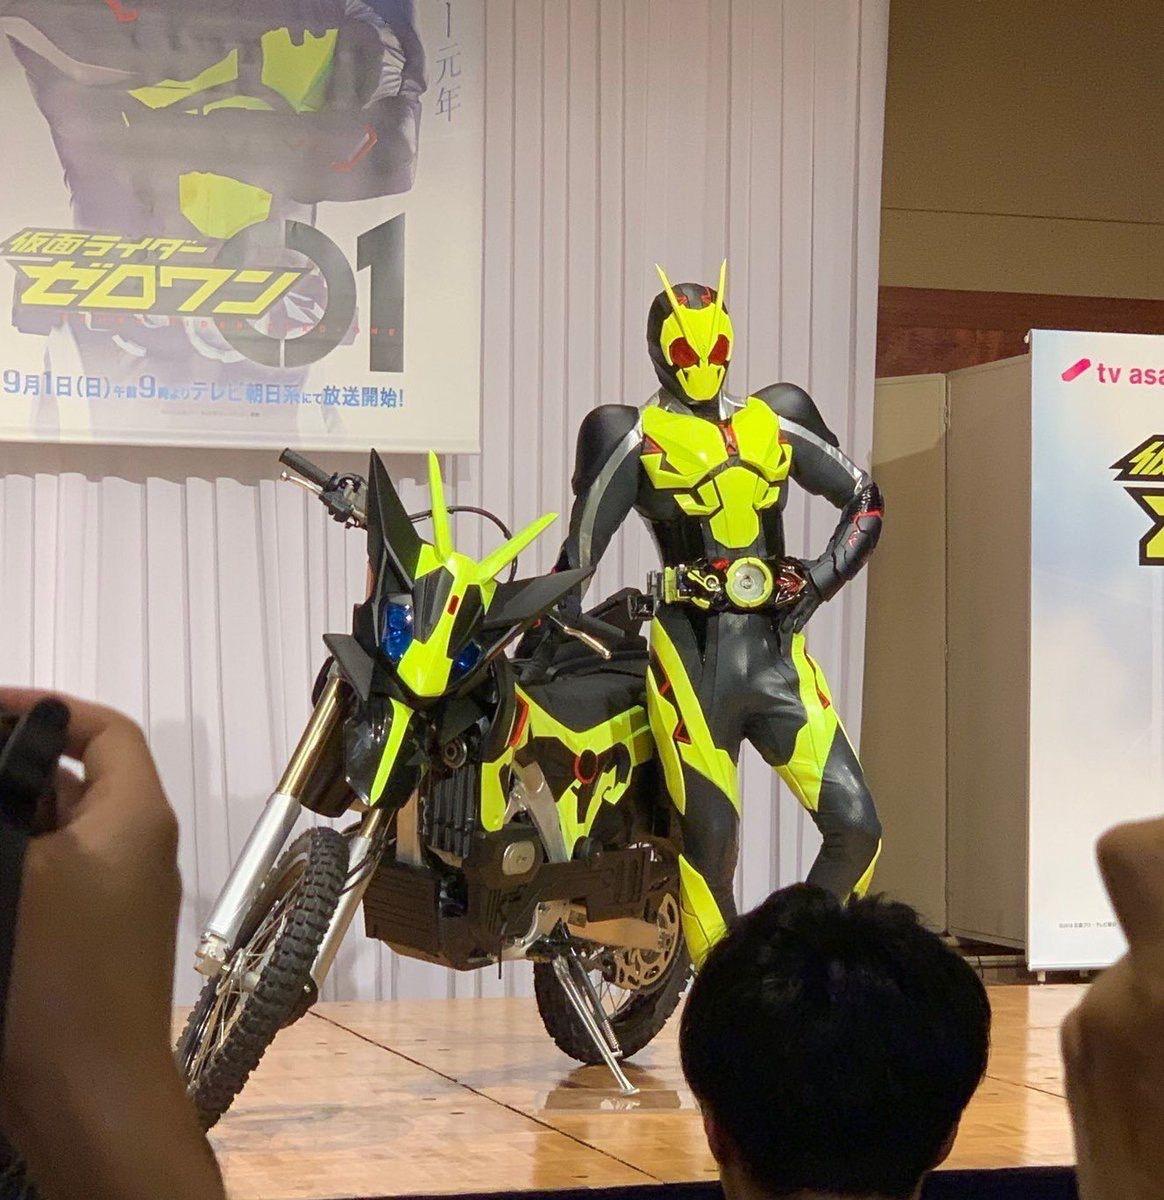 kamen rider zero one おしゃれまとめの人気アイデア pinterest joao victor 仮面ライダー 特撮ヒーロー ライダー